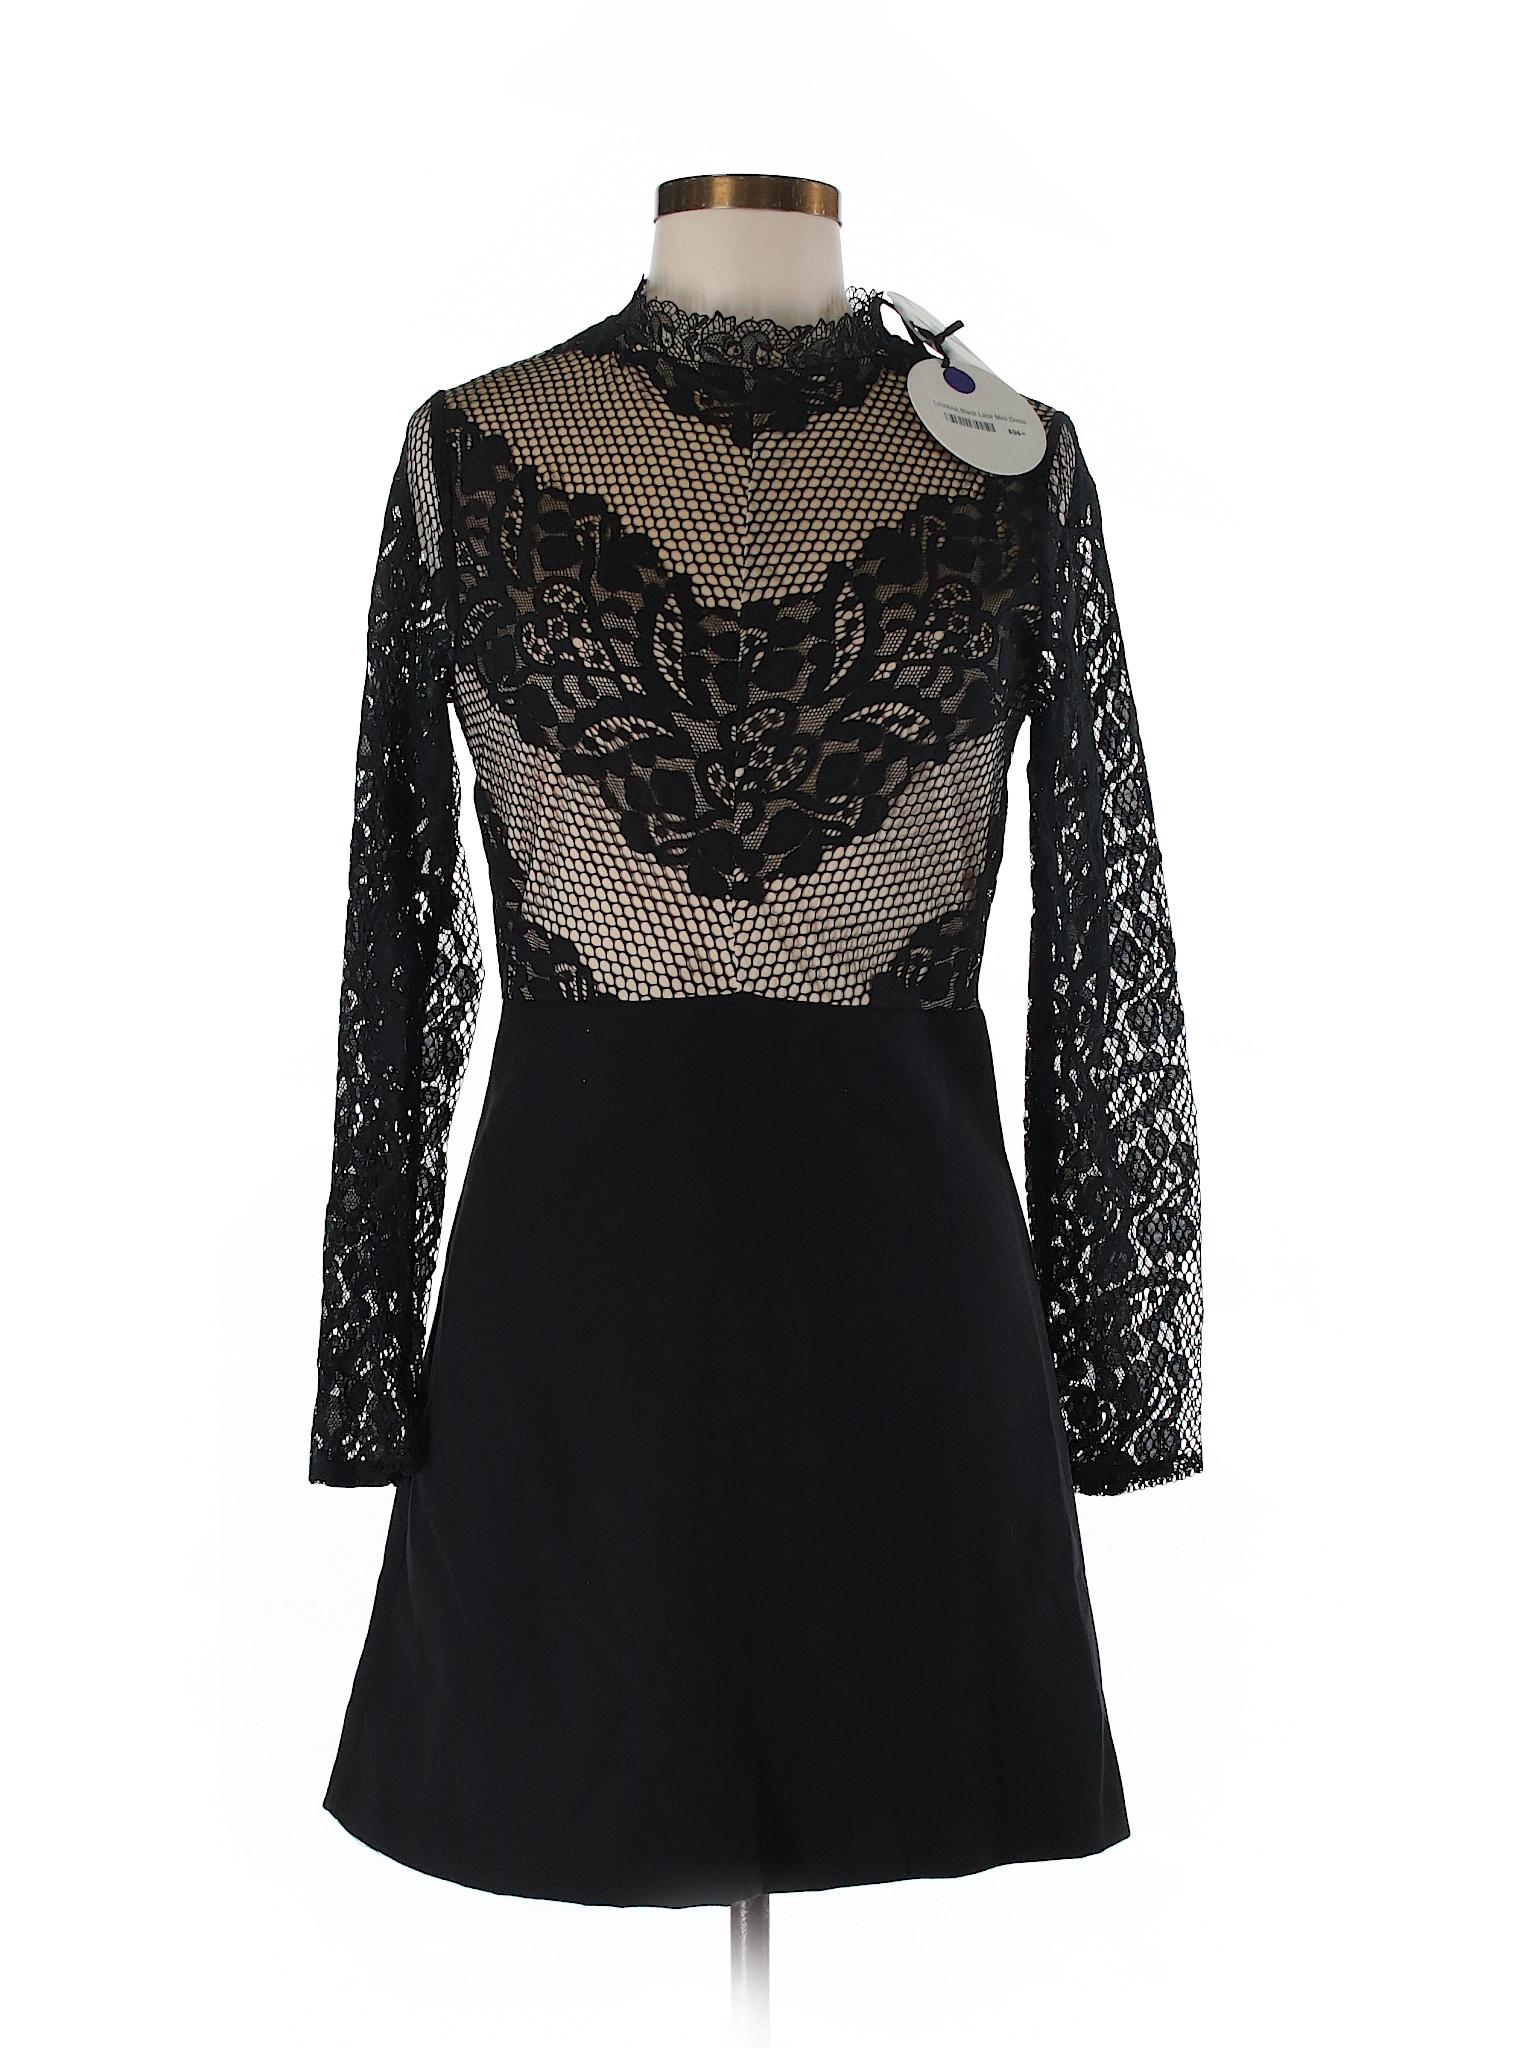 Dot Selling amp; Line Cocktail Dress rx80rPwqE